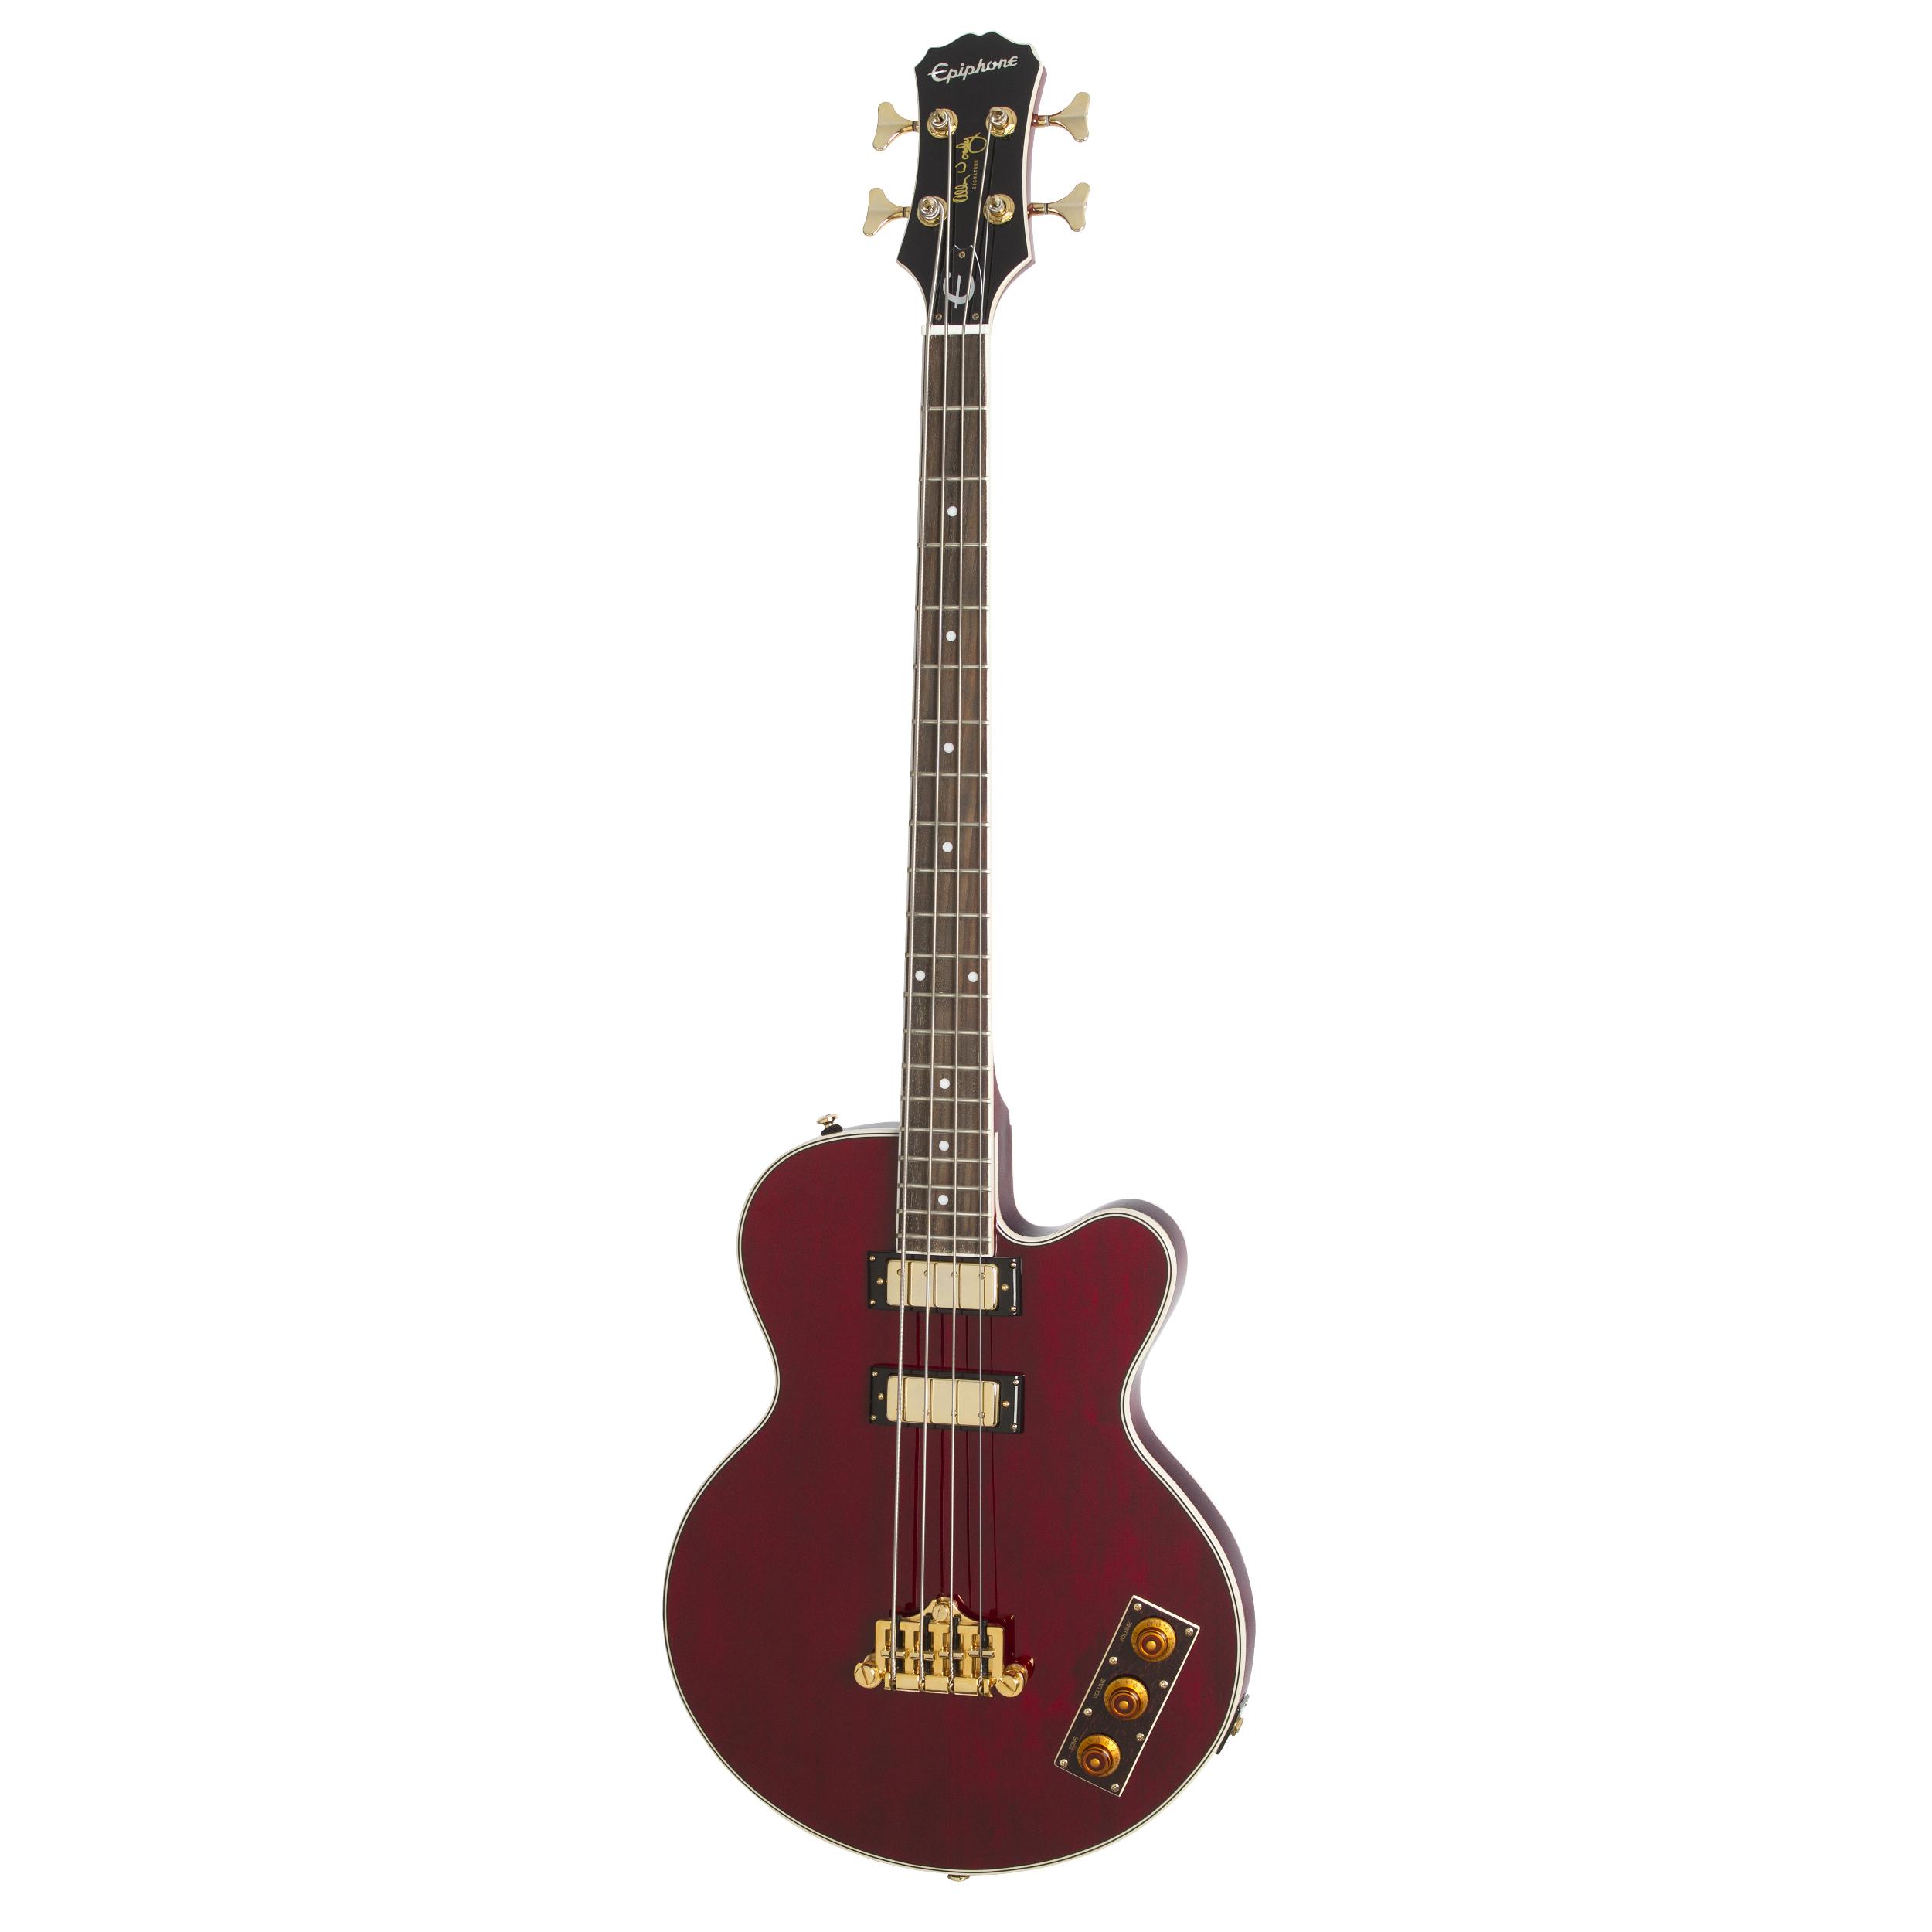 Epiphone Allen Woody Rumblekat Bass - Wine Red Guitar